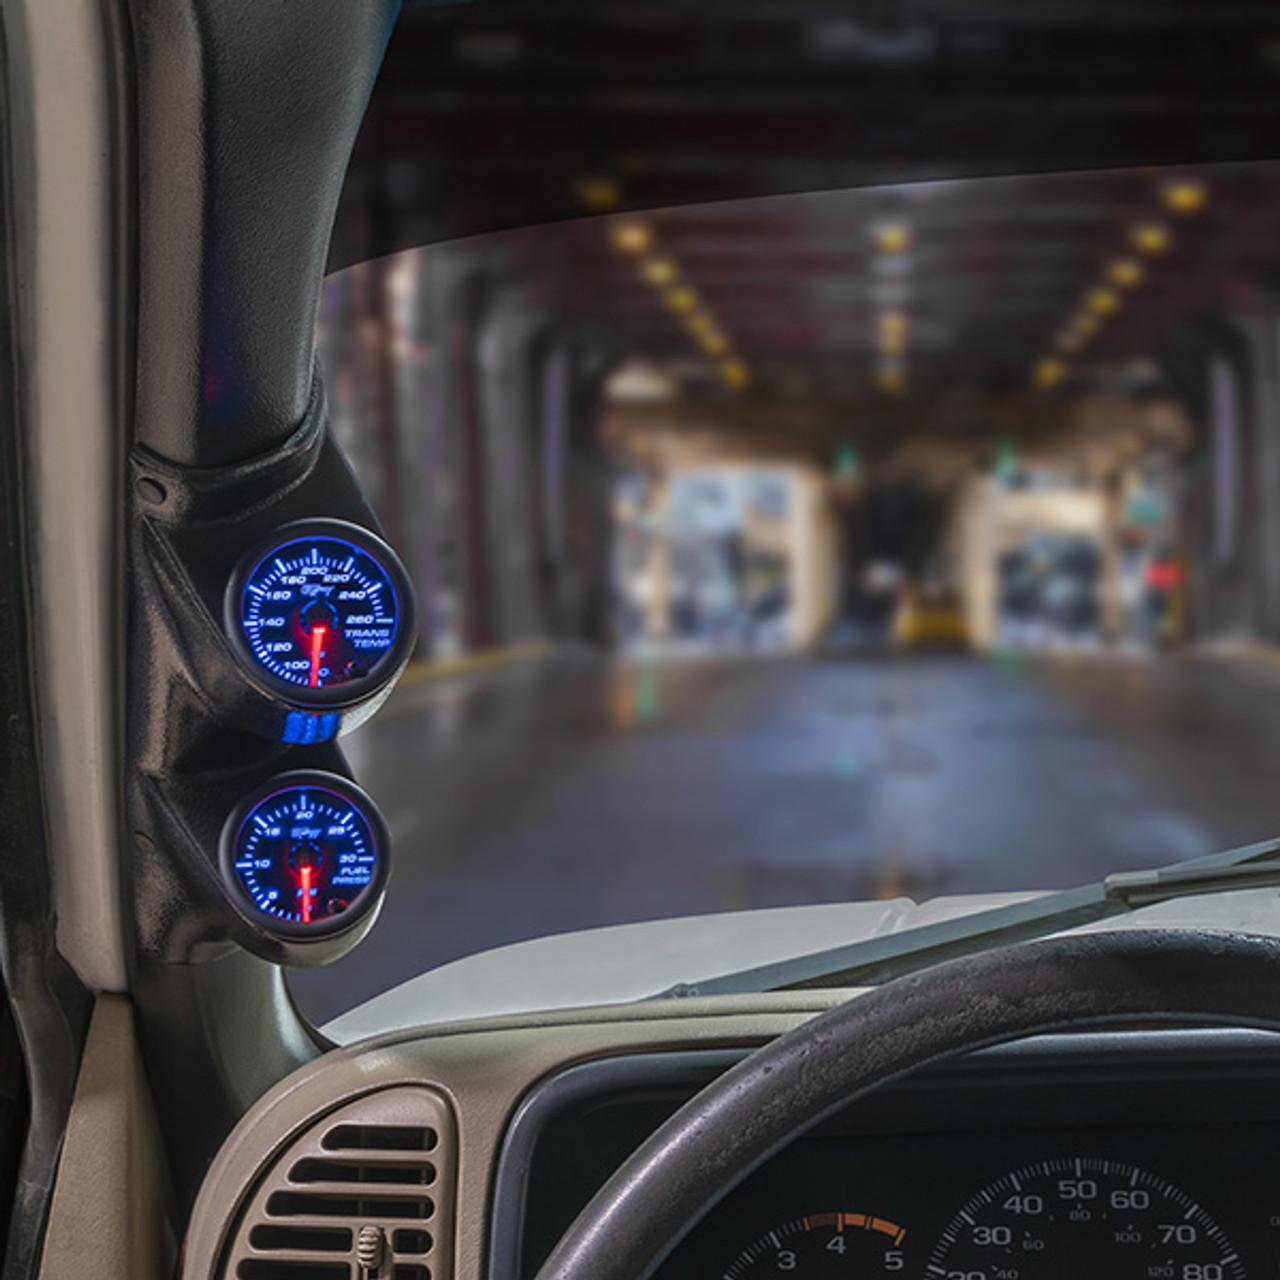 Chevrolet Silverado Lmm Fuel Gauge Wiring | wiring diagram energy acoustics | Chevrolet Silverado Lmm Fuel Gauge Wiring |  | dimagrire-dieta.it